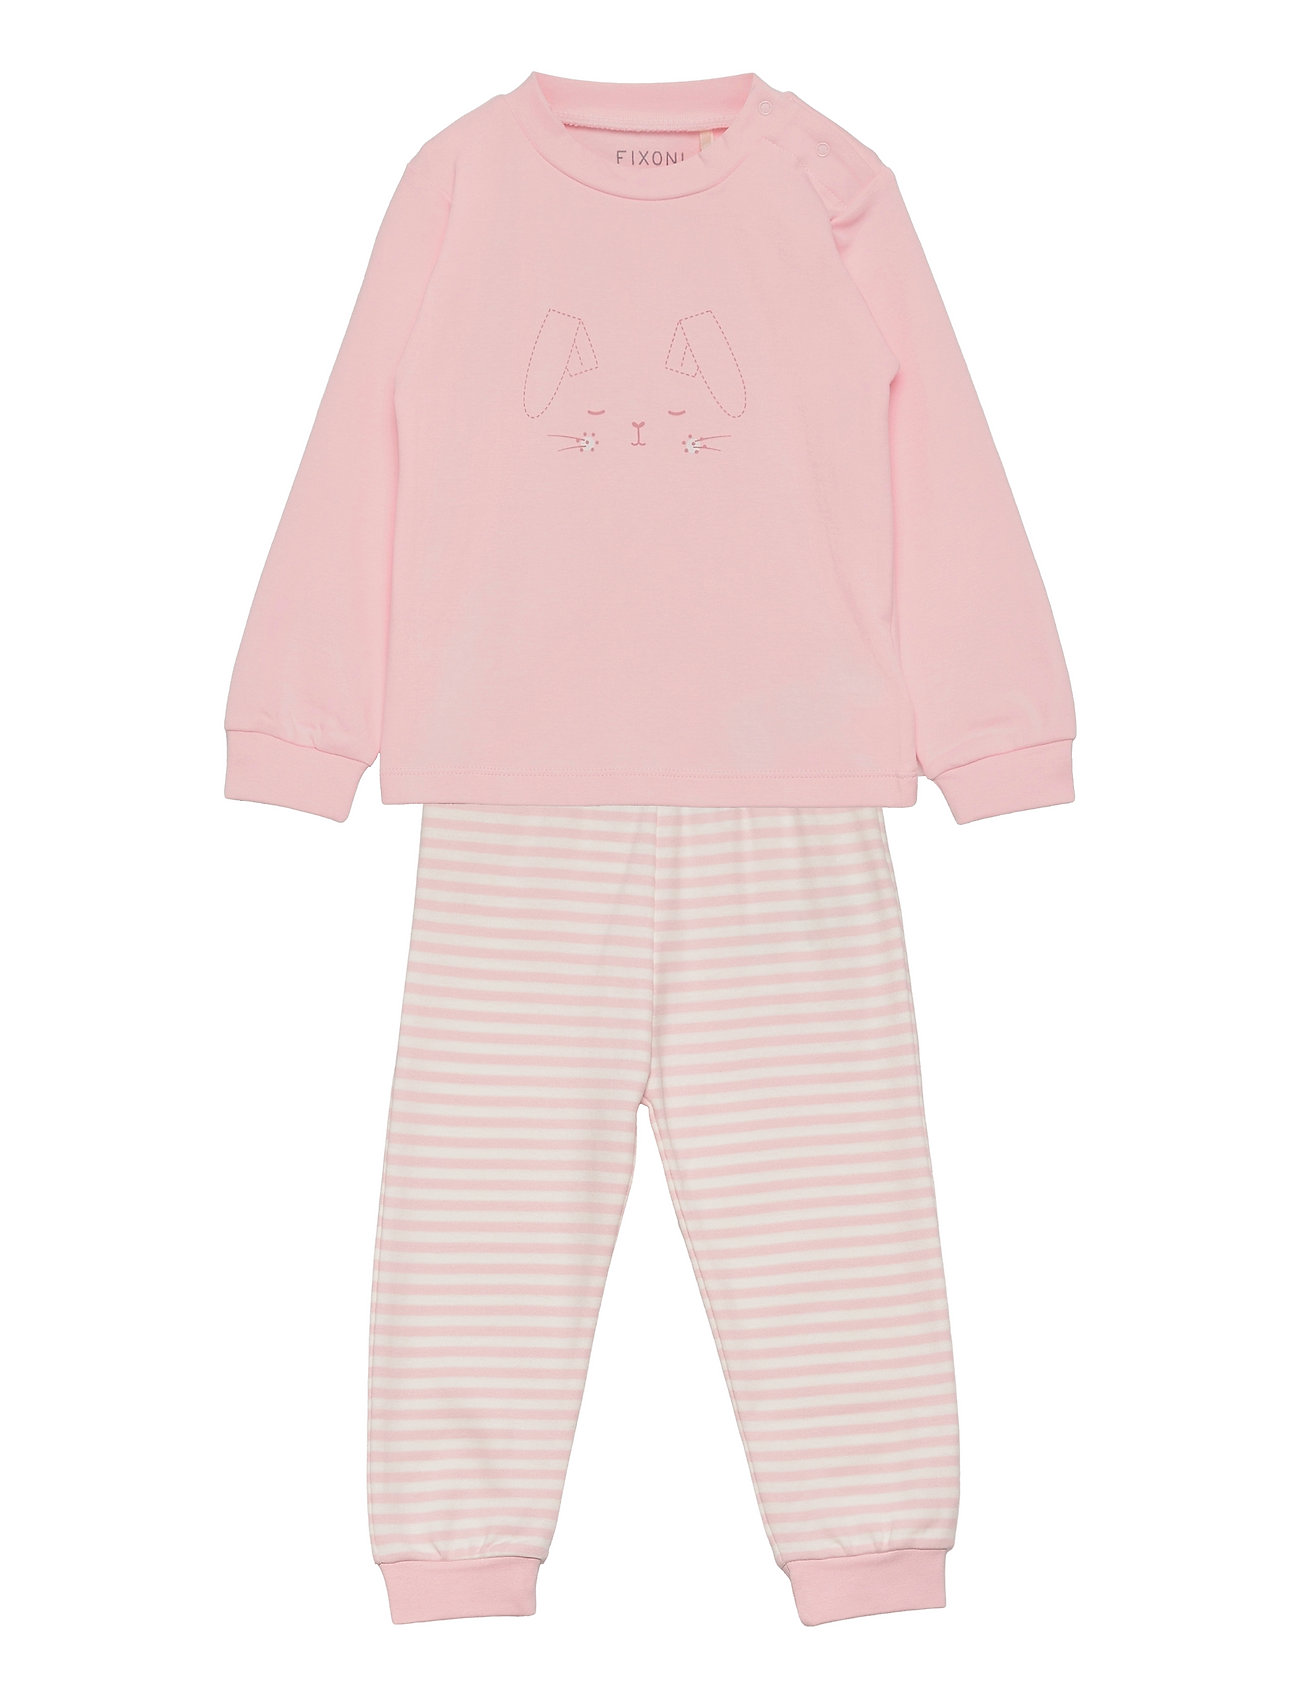 Pyjama Set Pyjamassæt Lyserød Fixoni